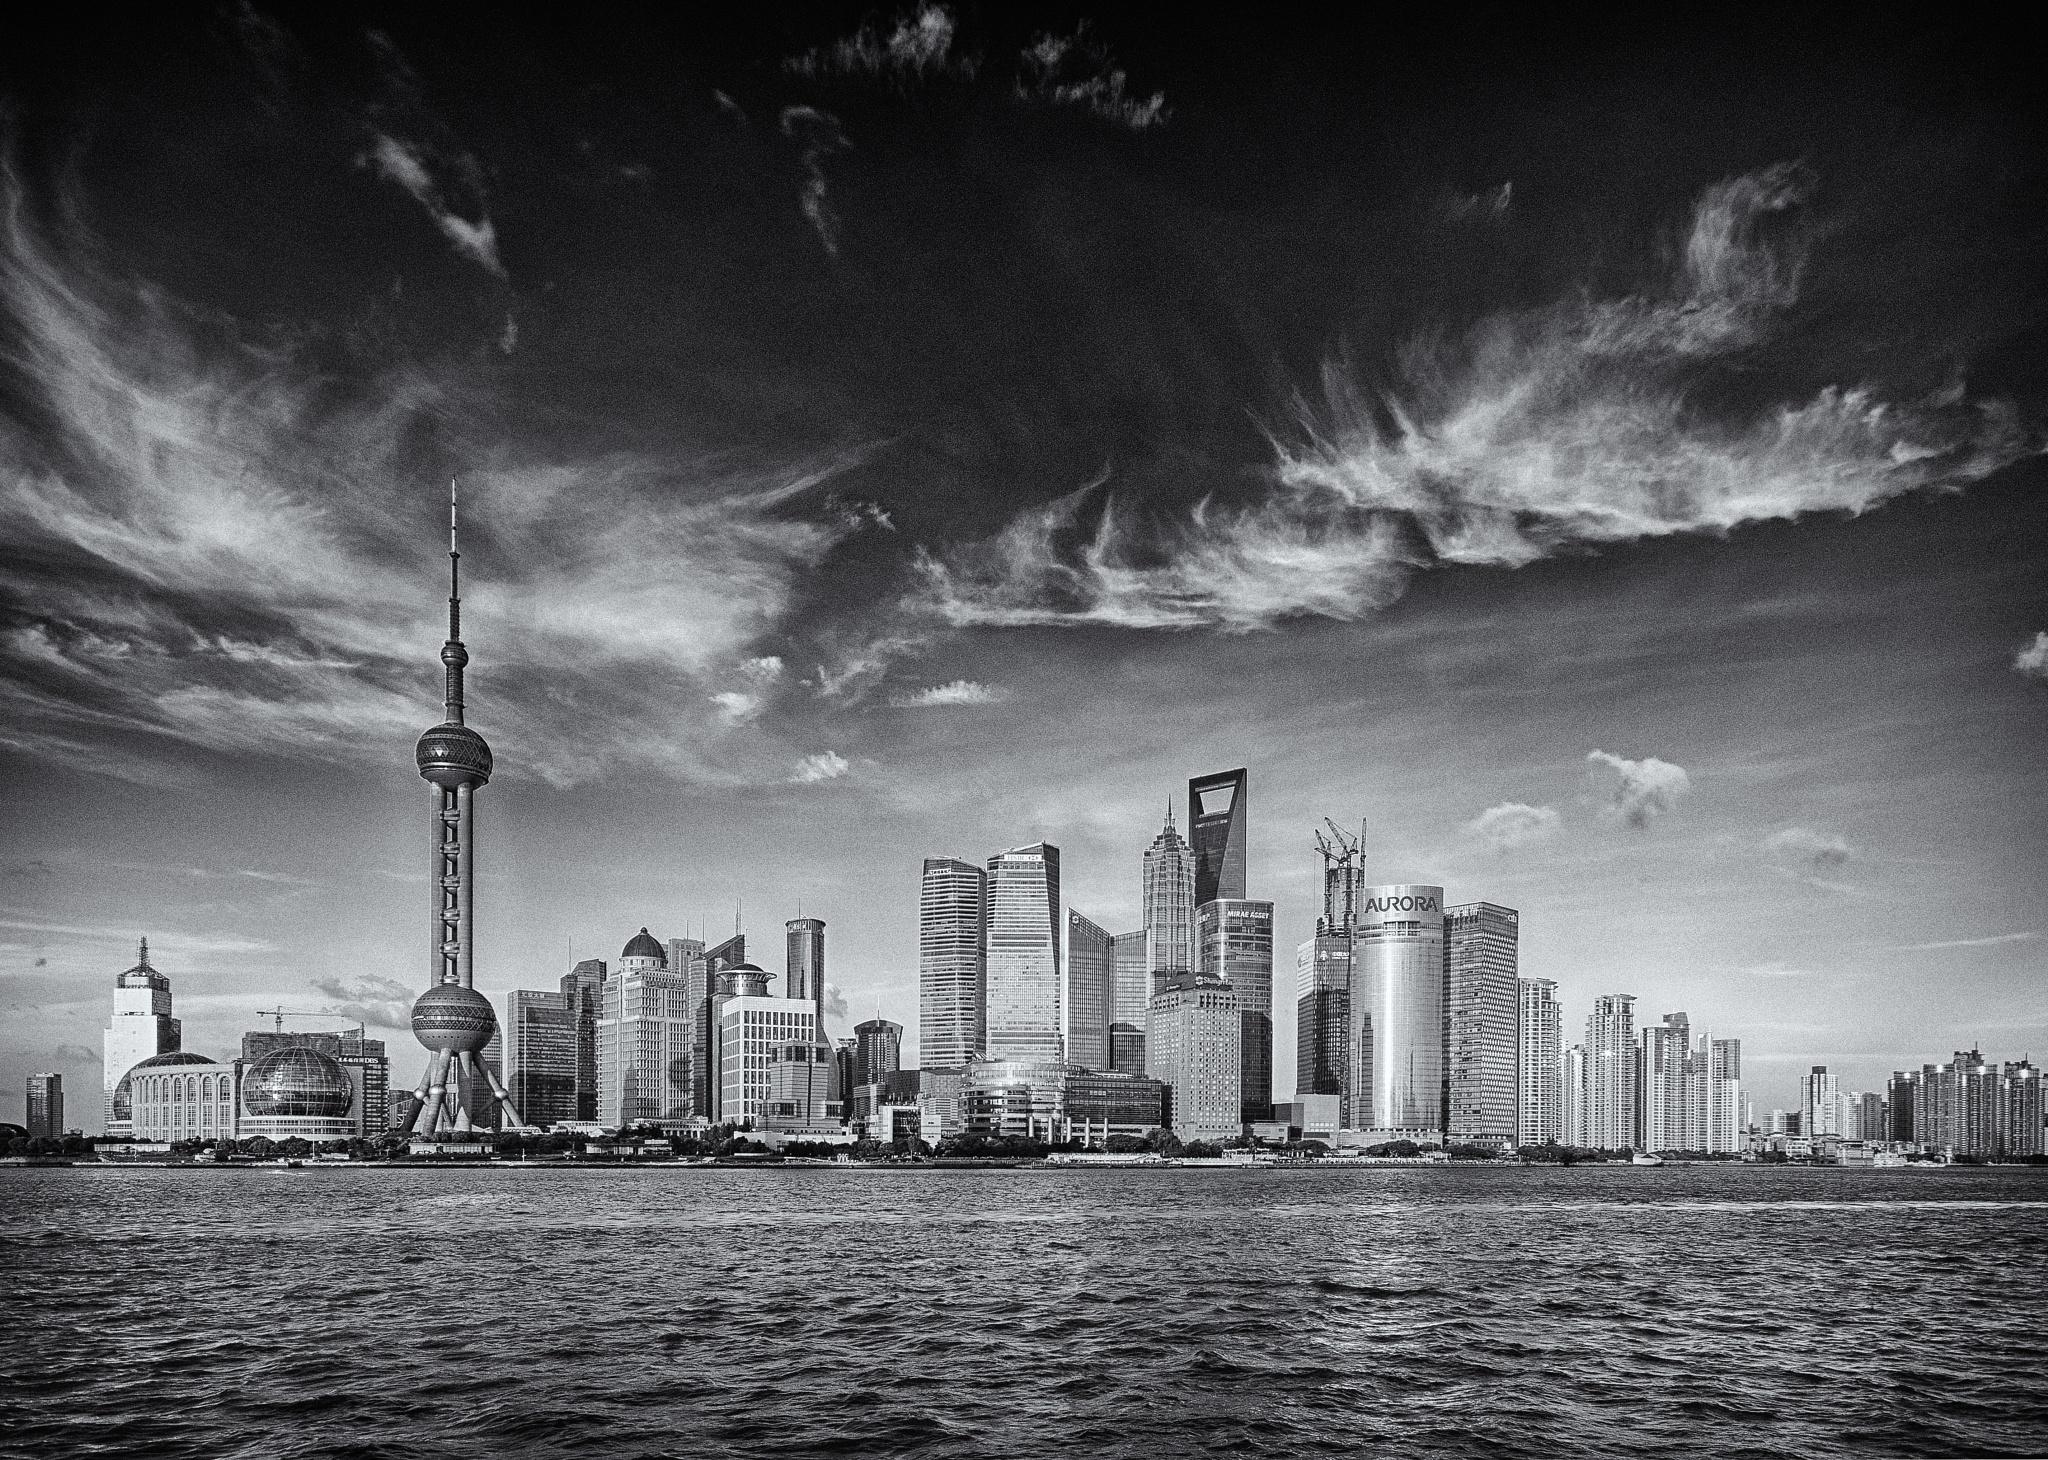 Pudong by Attila Balogh